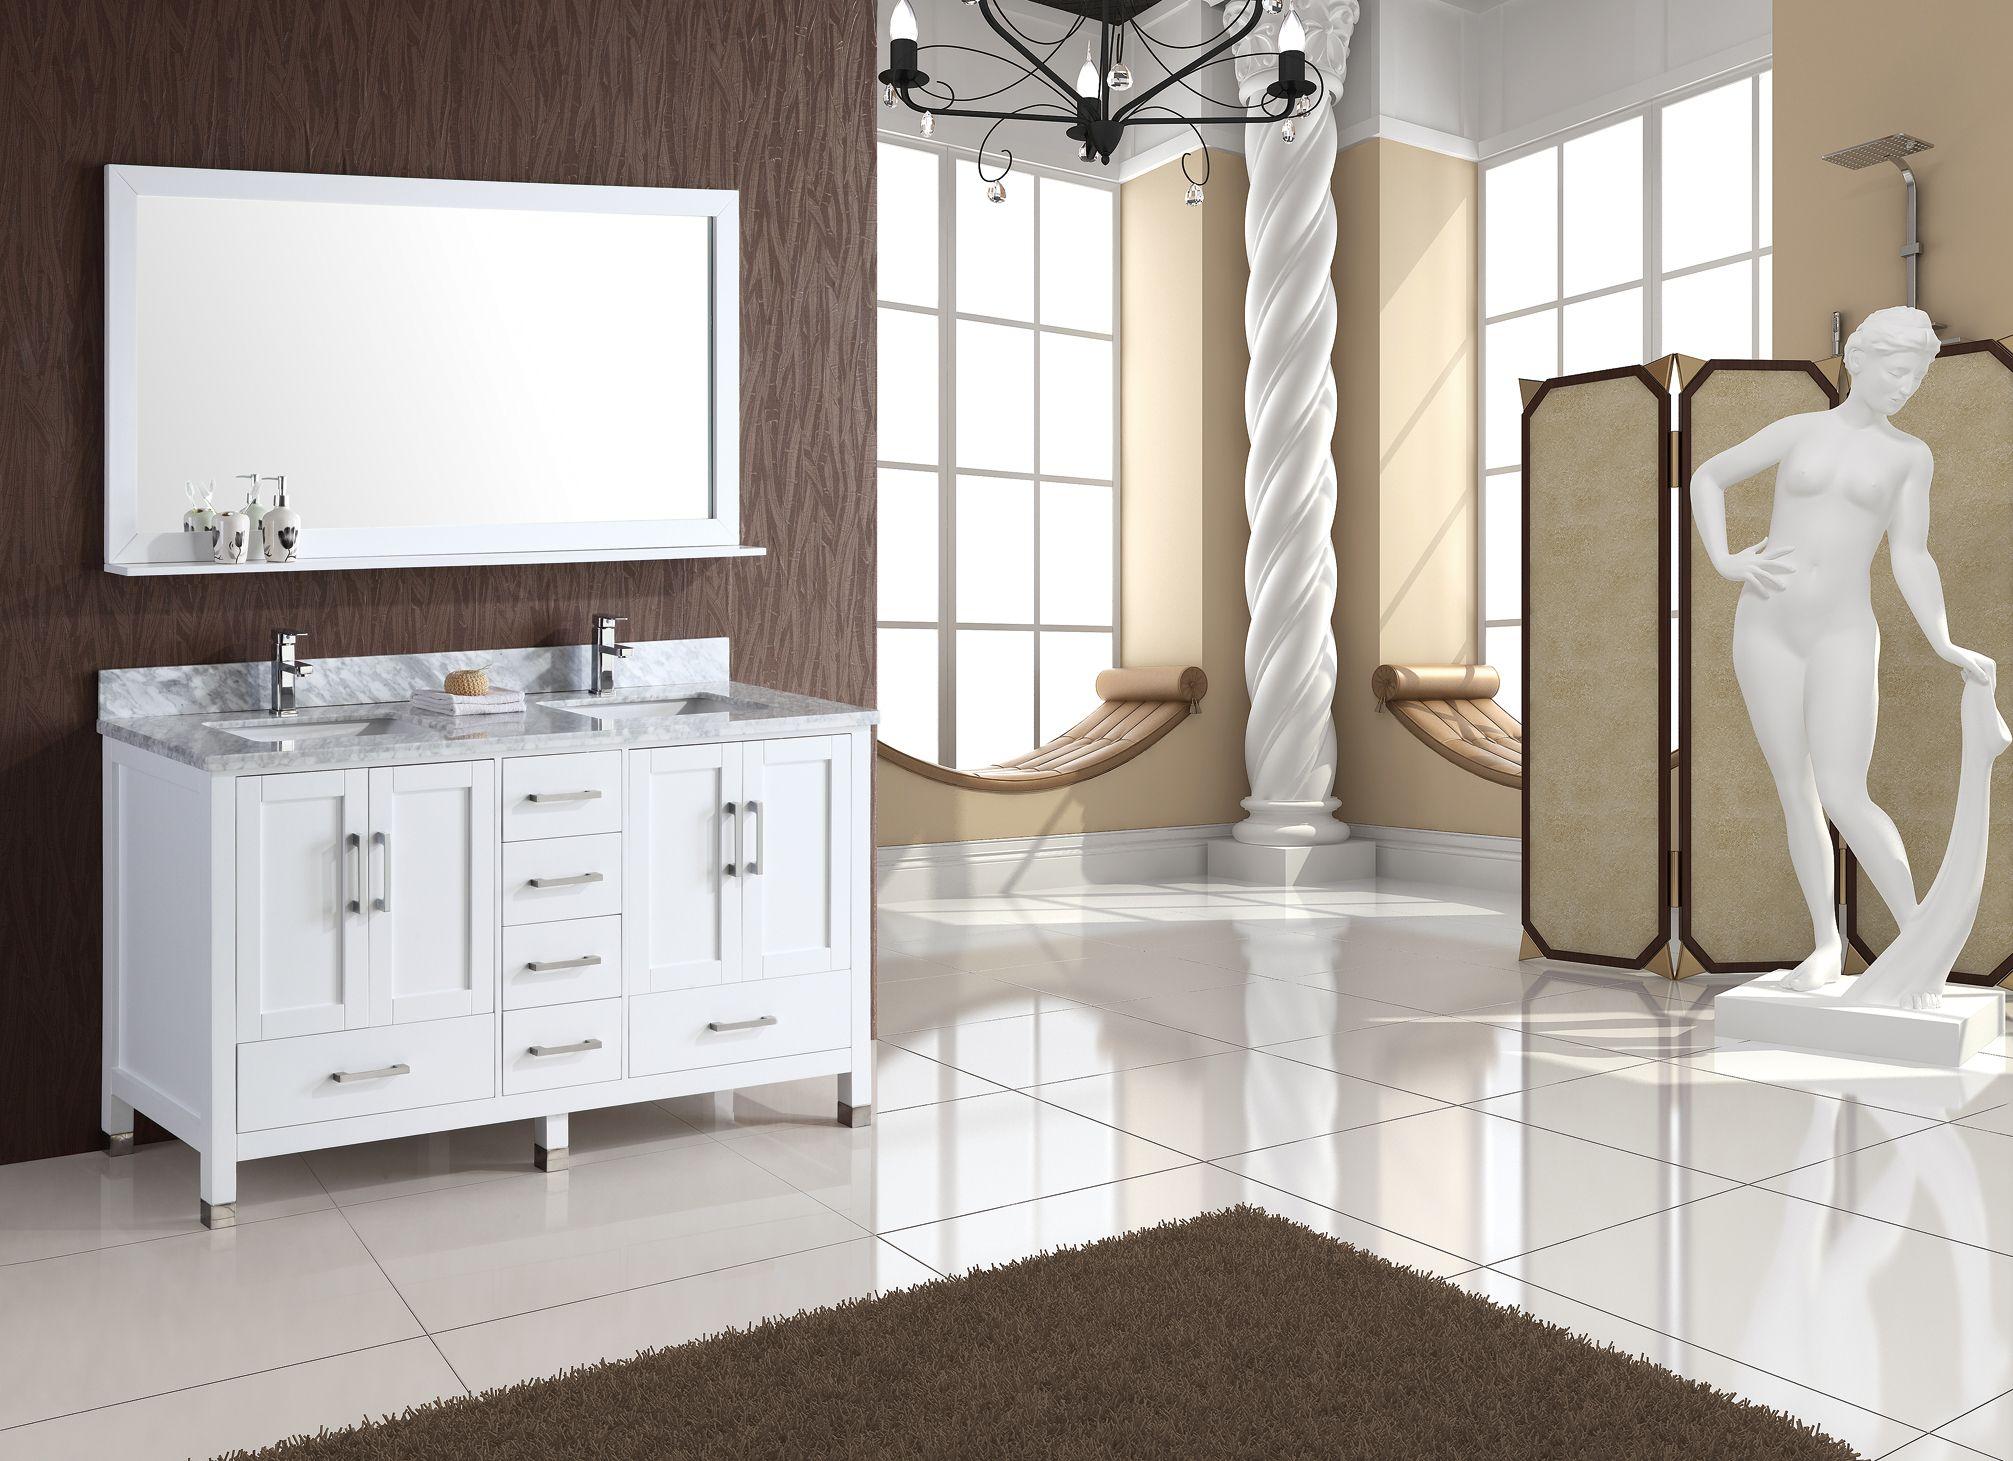 Latest Posts Under: Bathroom mirrors   bathroom design 2017-2018 ...